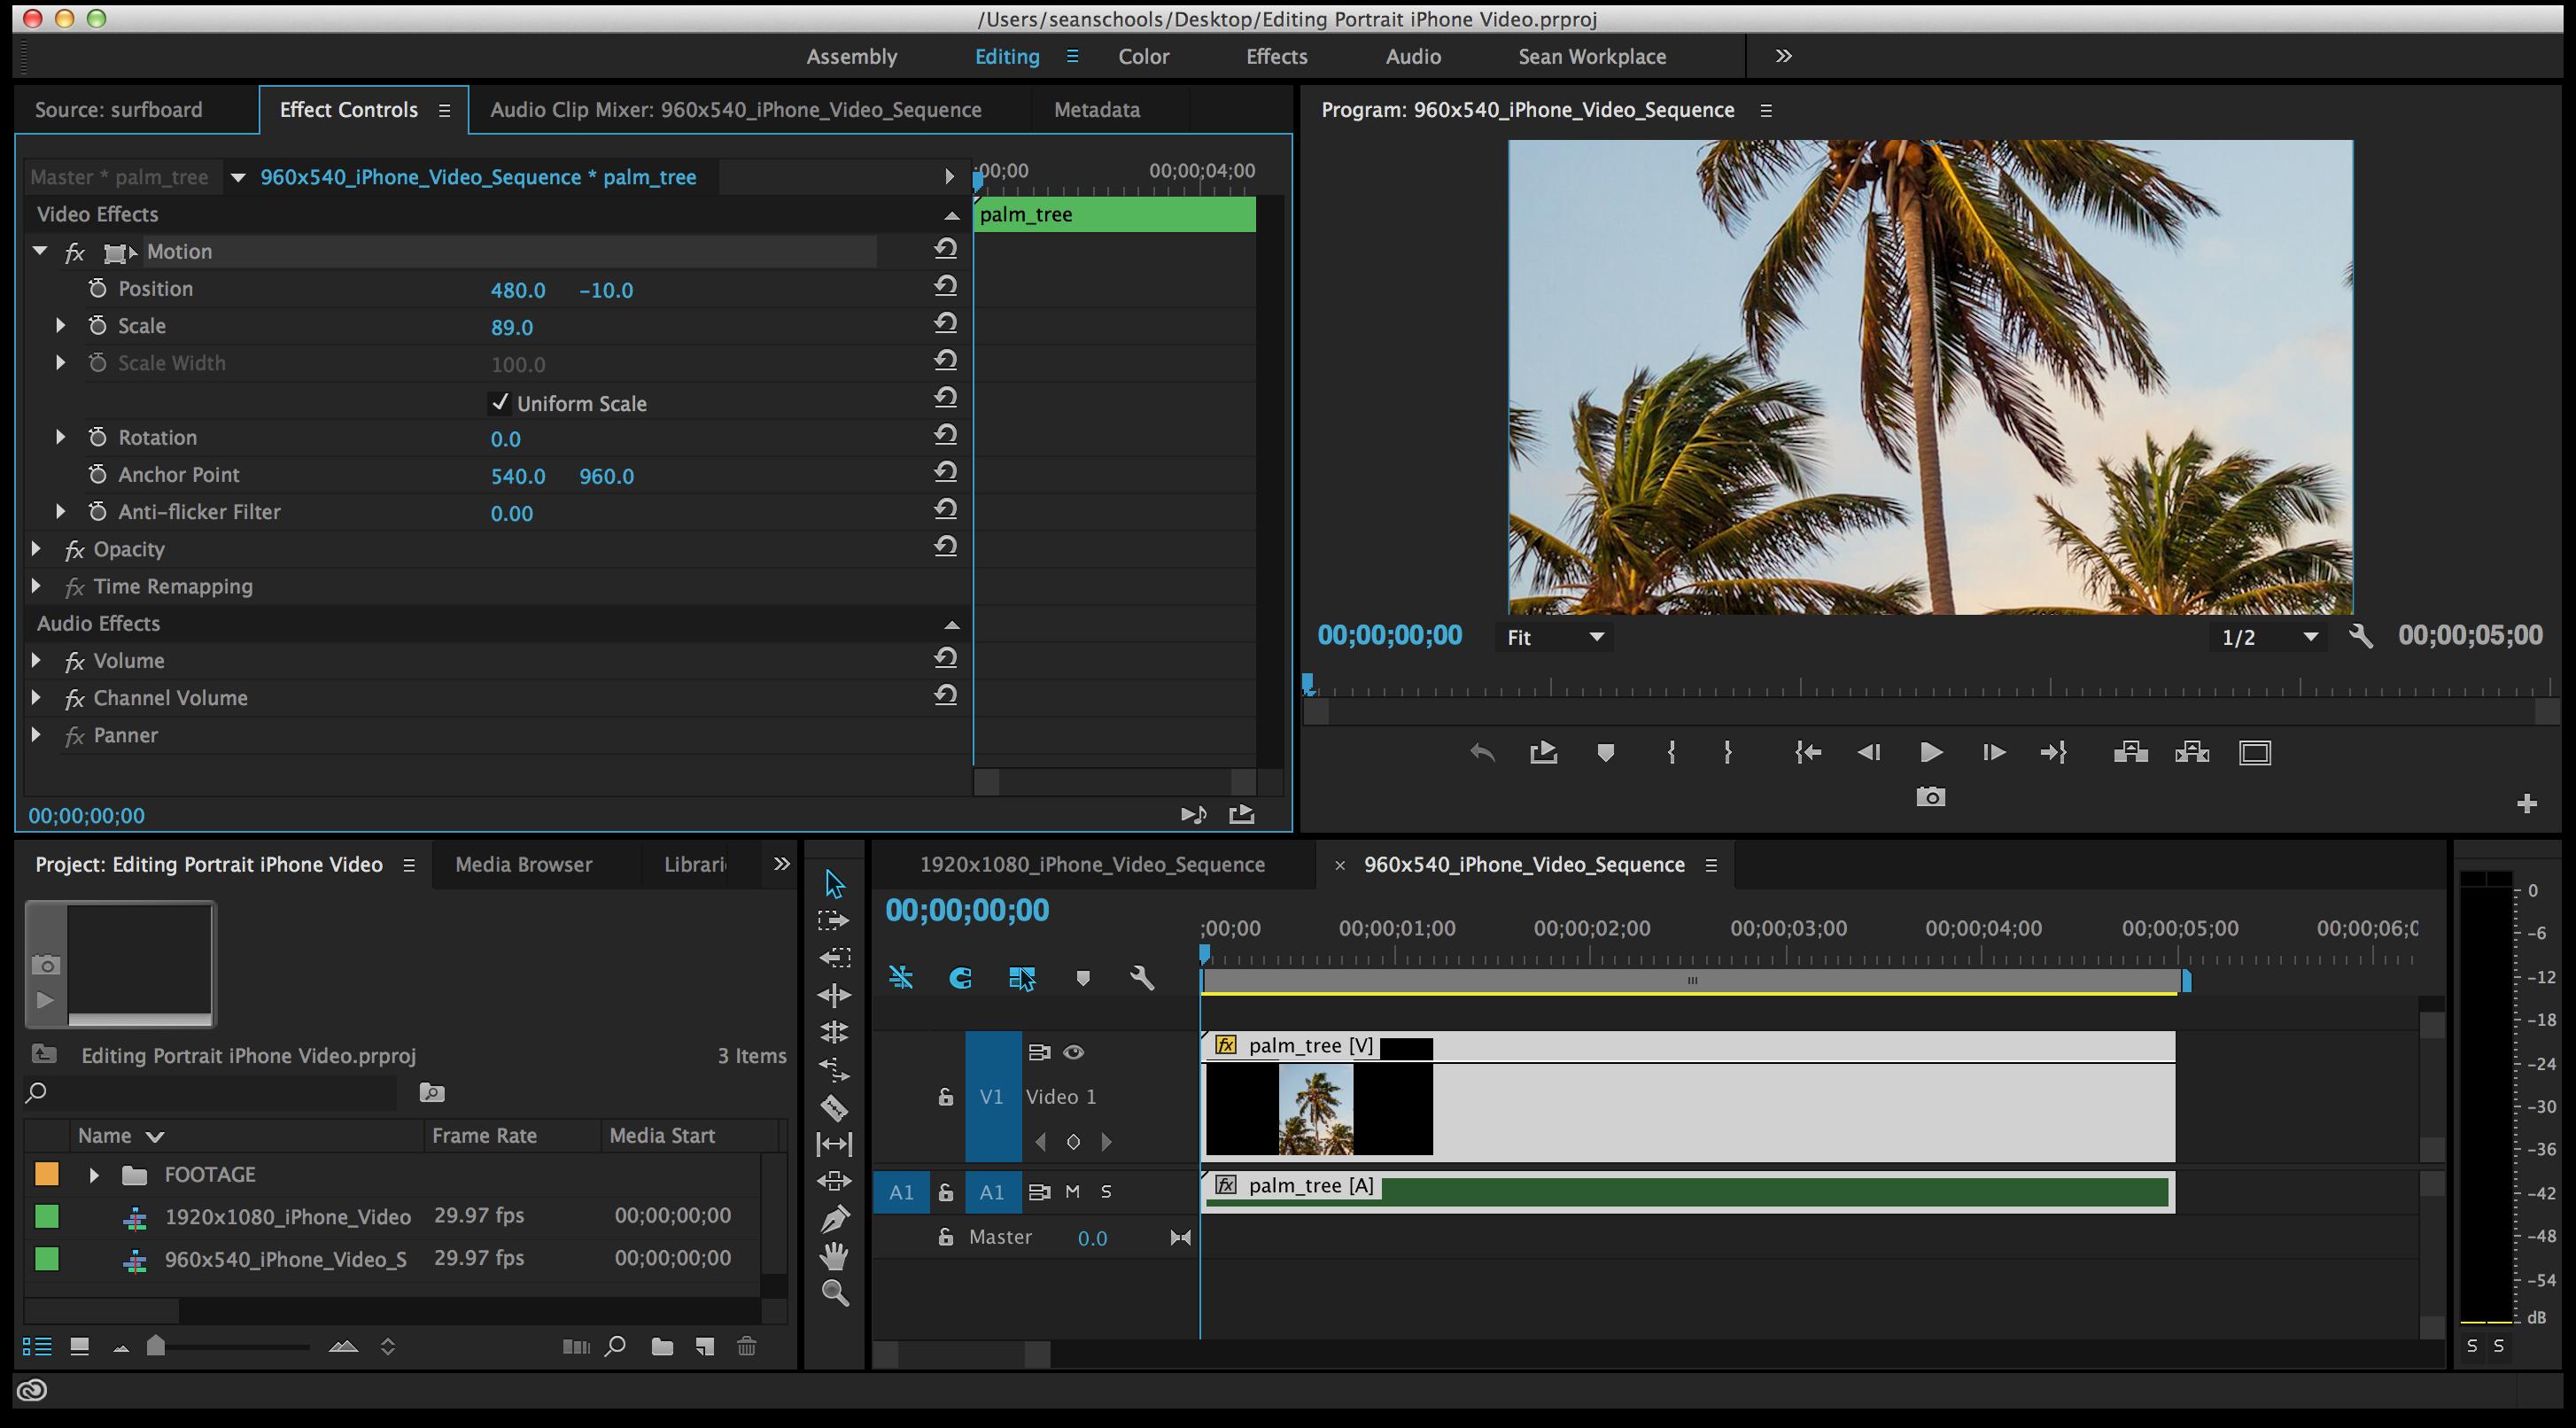 Adobe flash cs3 professional pre crack keygen | guihillcel